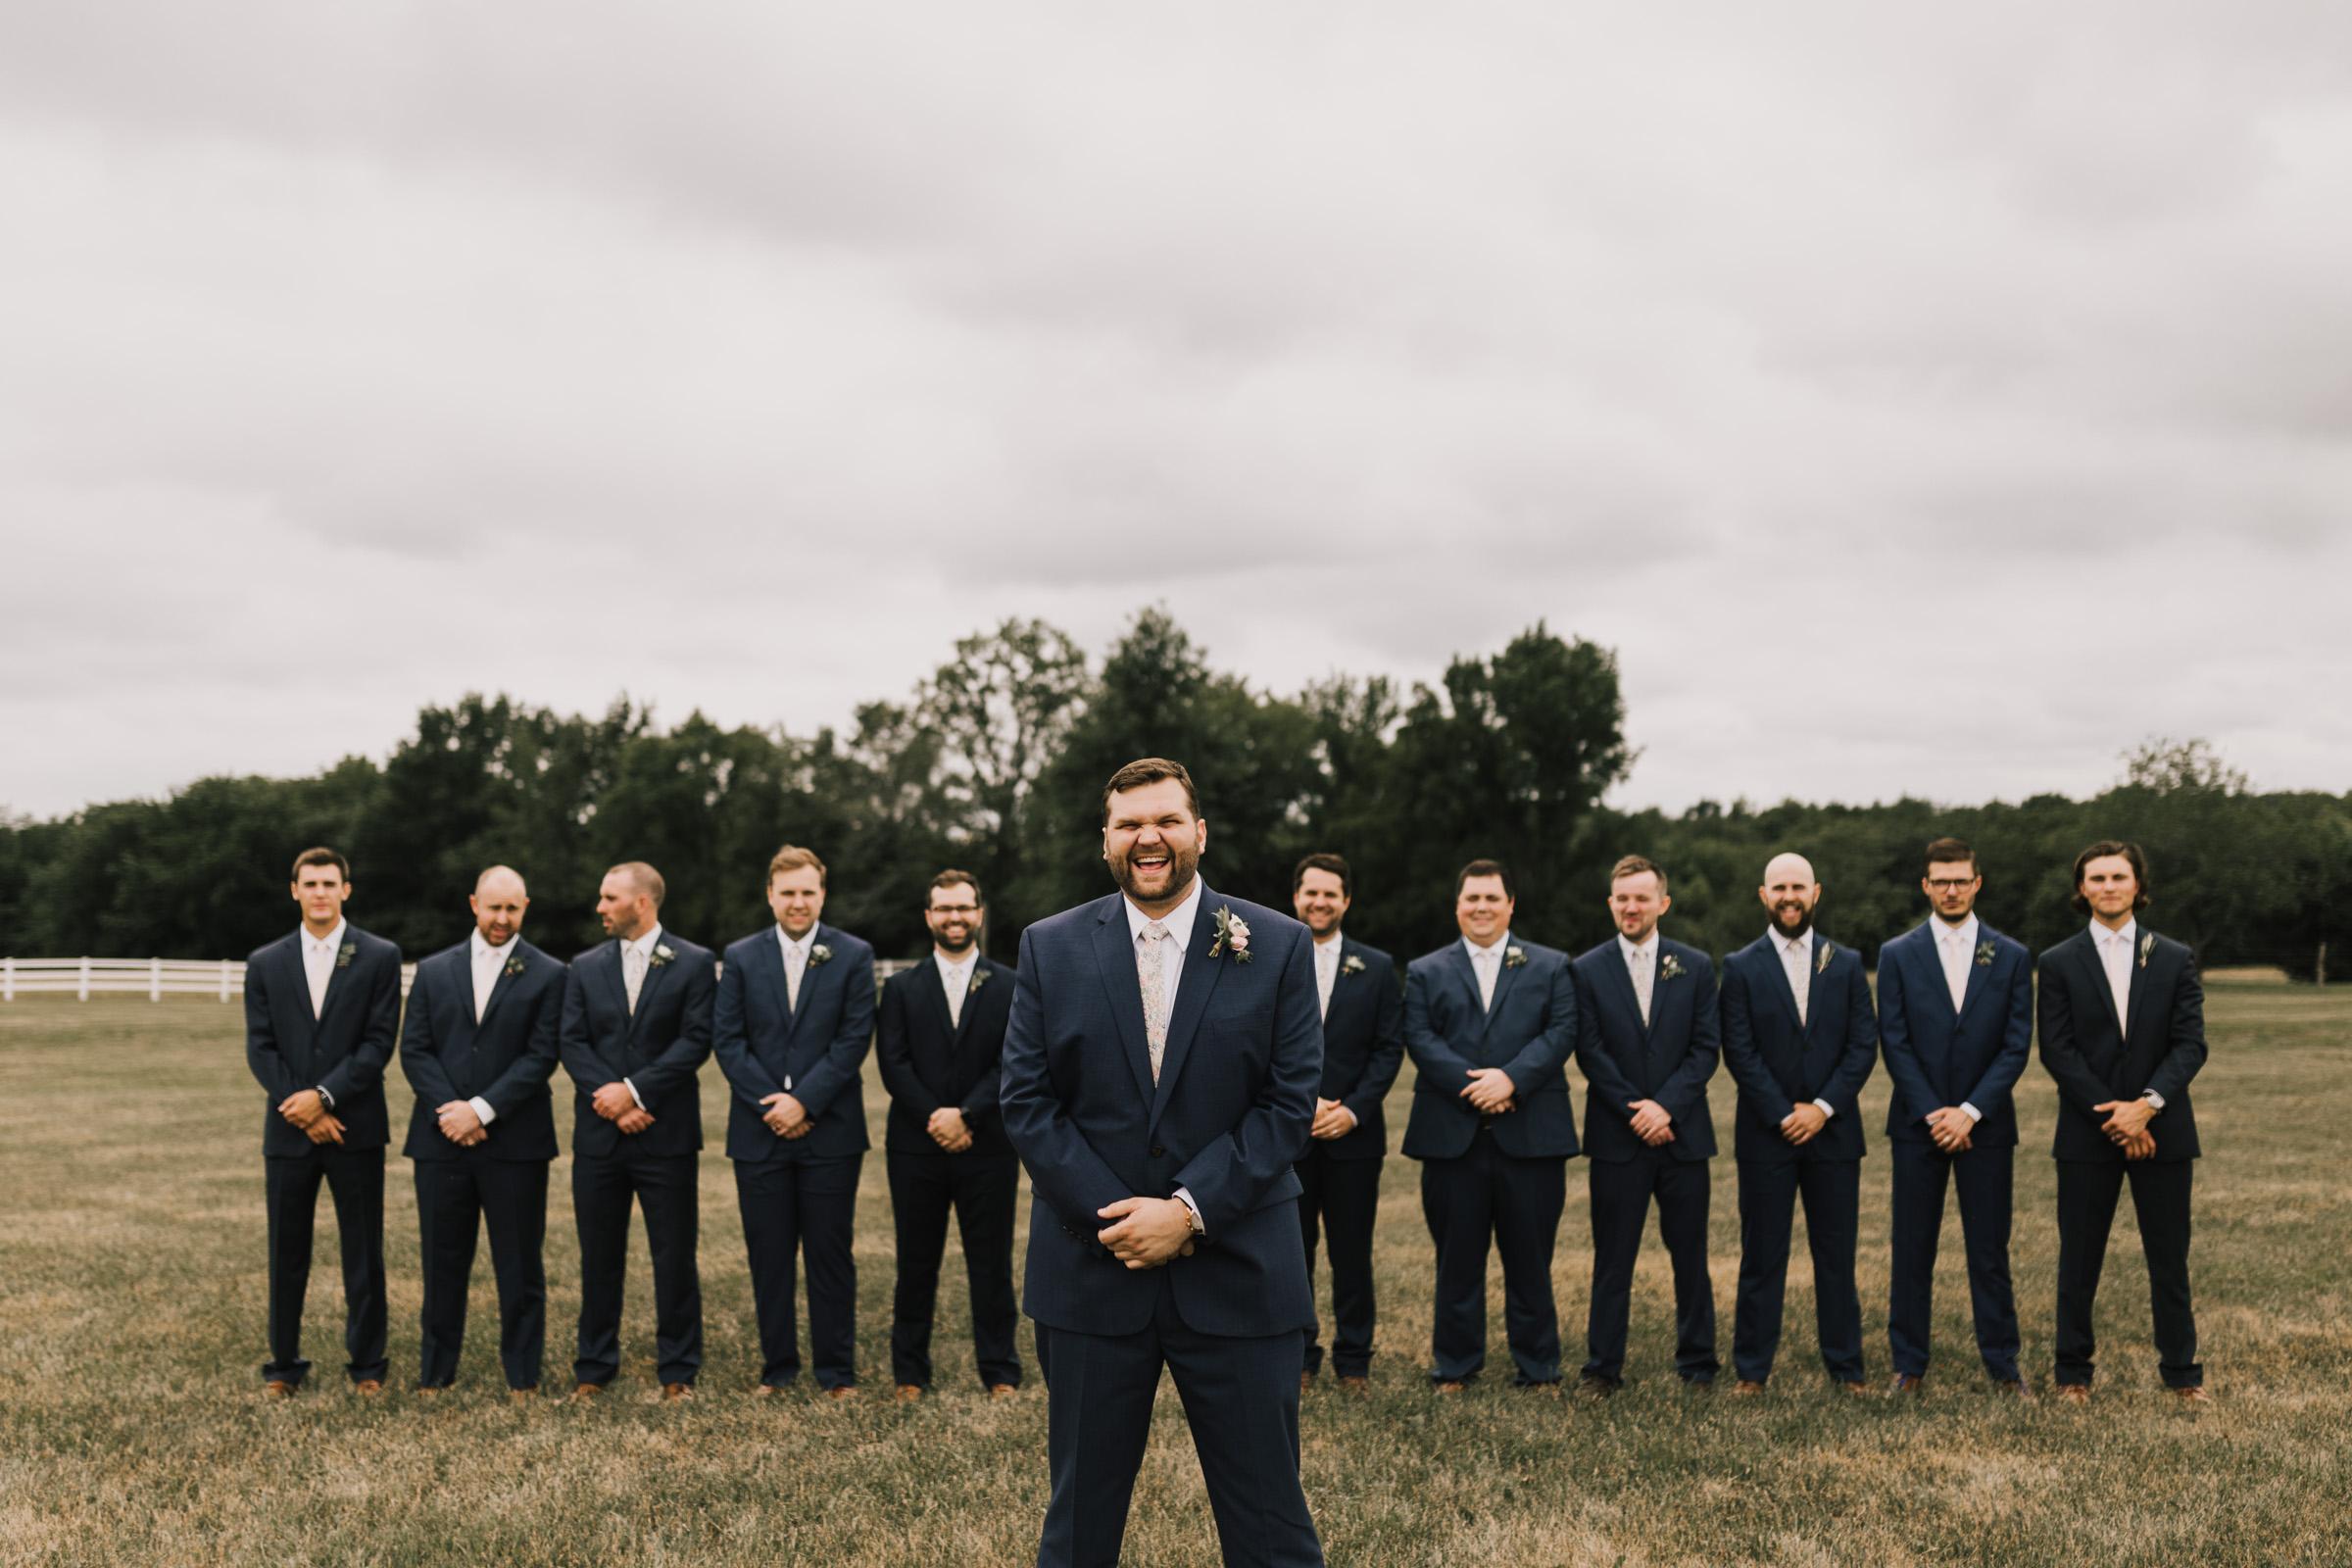 alyssa barletter photography summer odessa missouri wedding kansas city photographer-28.jpg